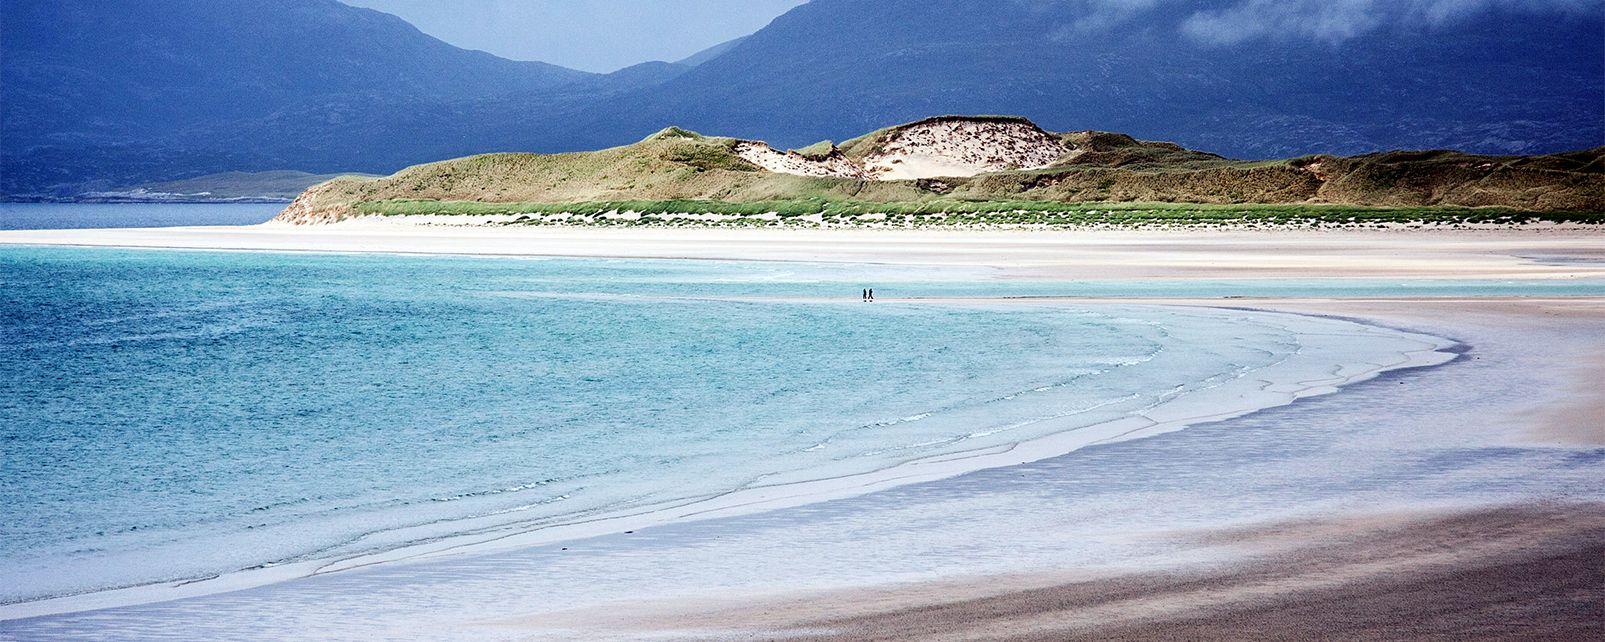 Les Western Isles , Les Western Isles, Écosse , Royaume-Uni